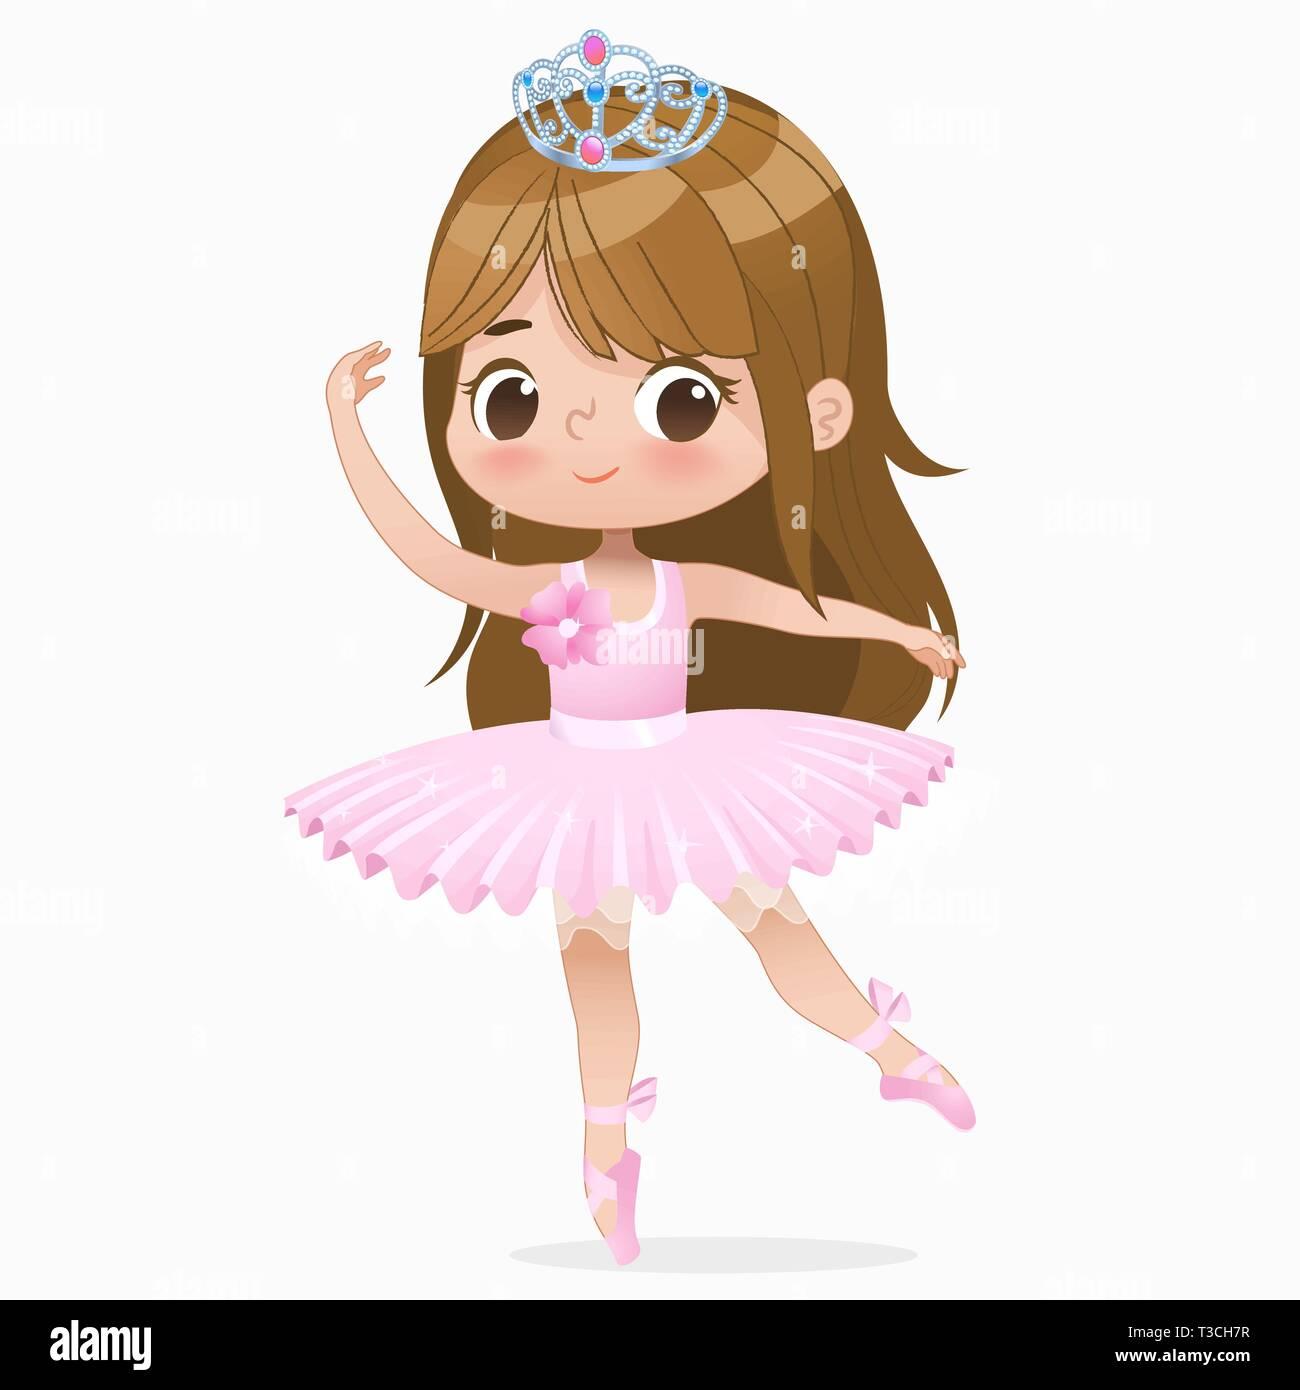 Cute Small Brown Hair Girl Ballerina Dance Isolated Caucasian